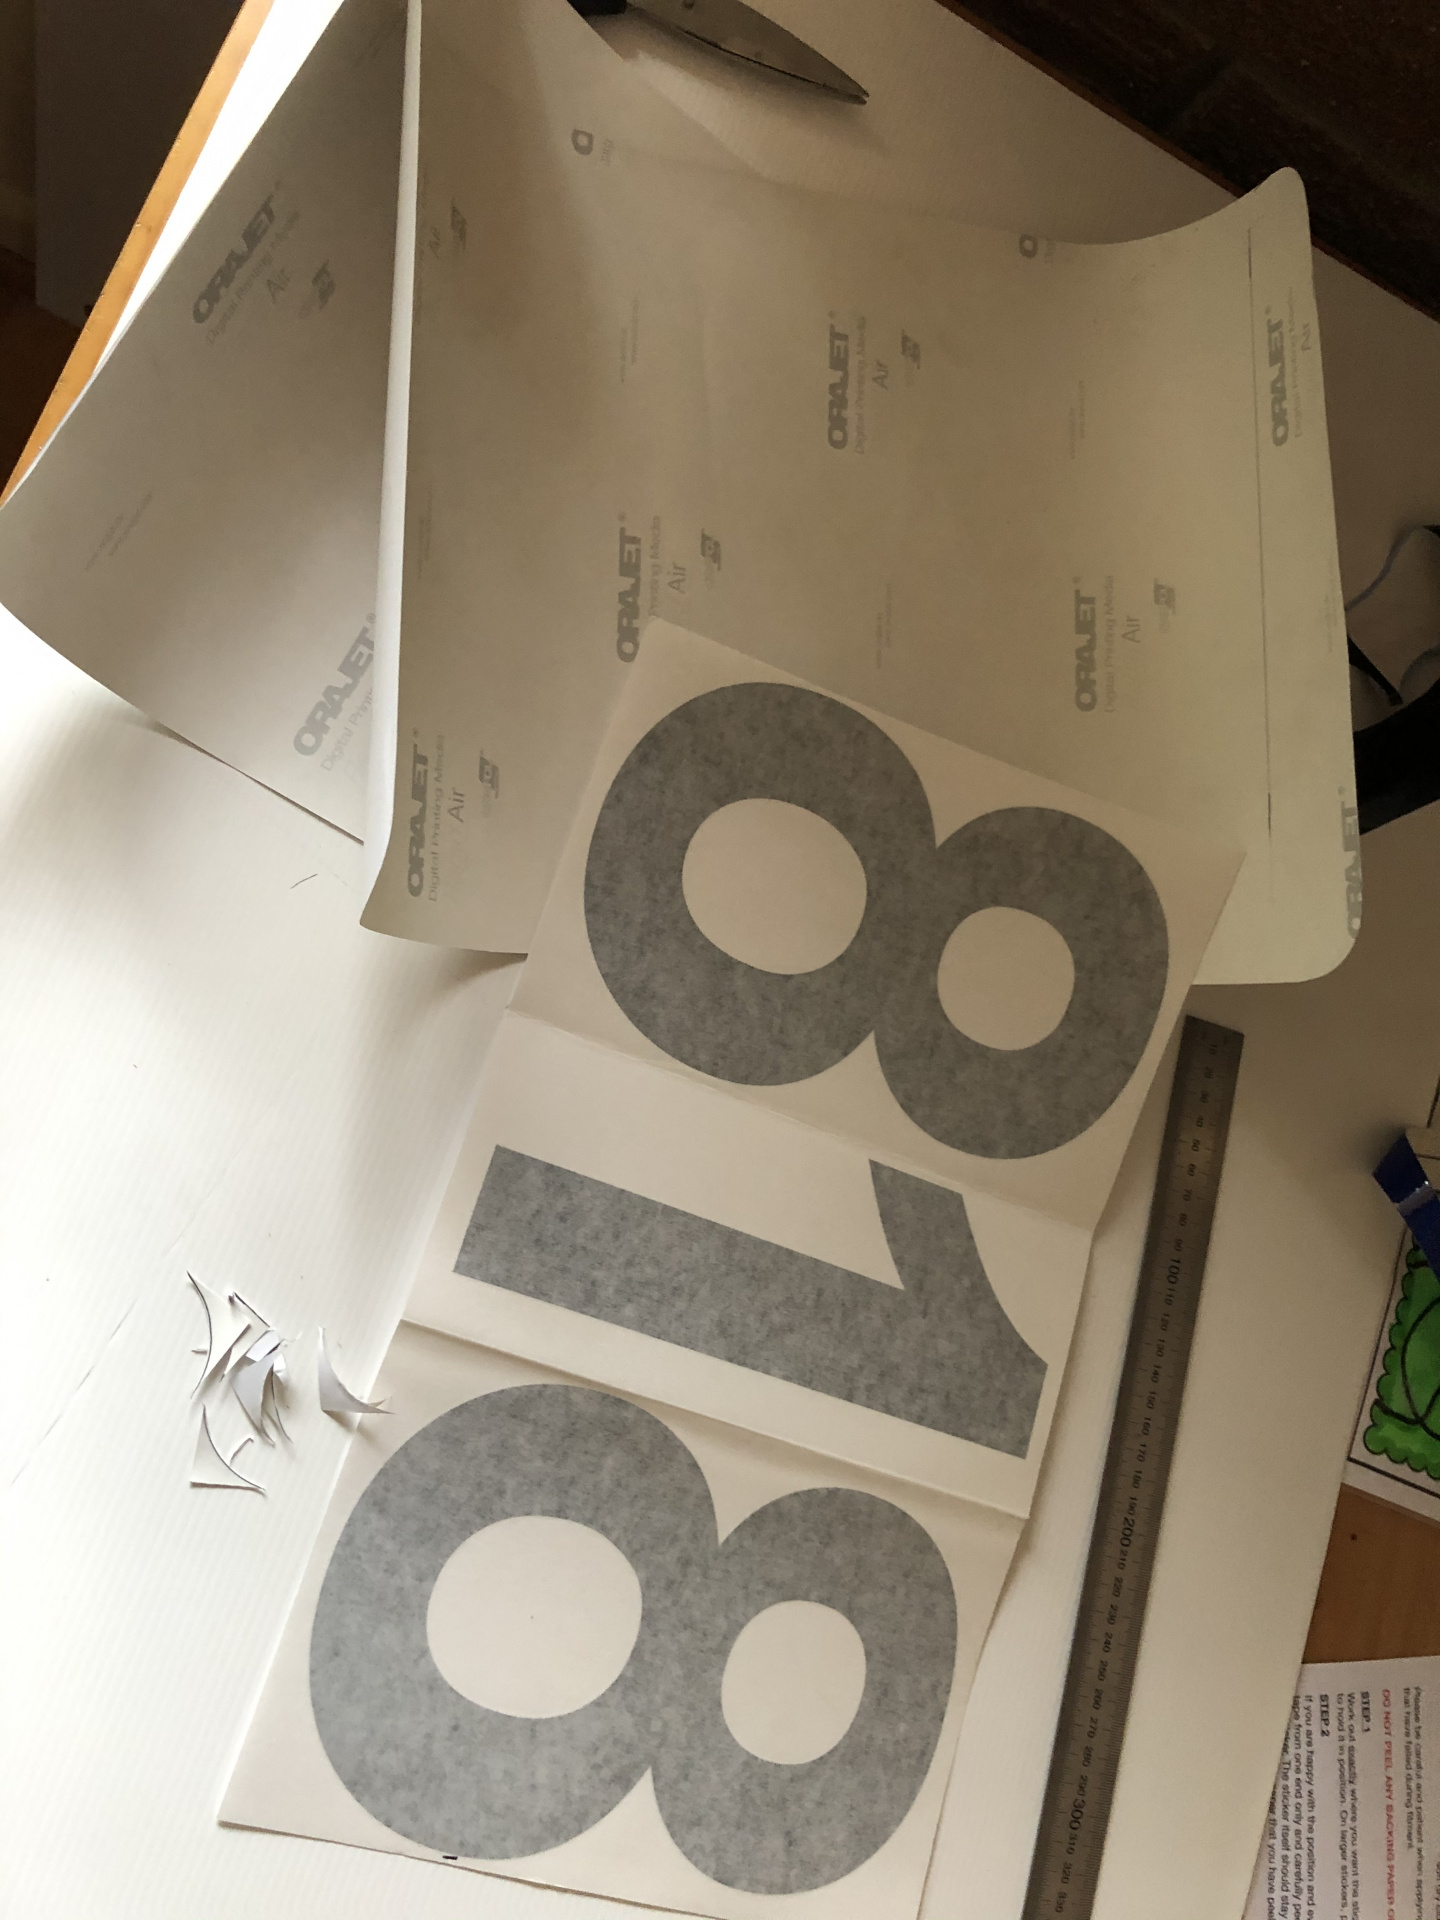 3C1298CB-3B7A-46ED-B358-26D123306301.jpeg